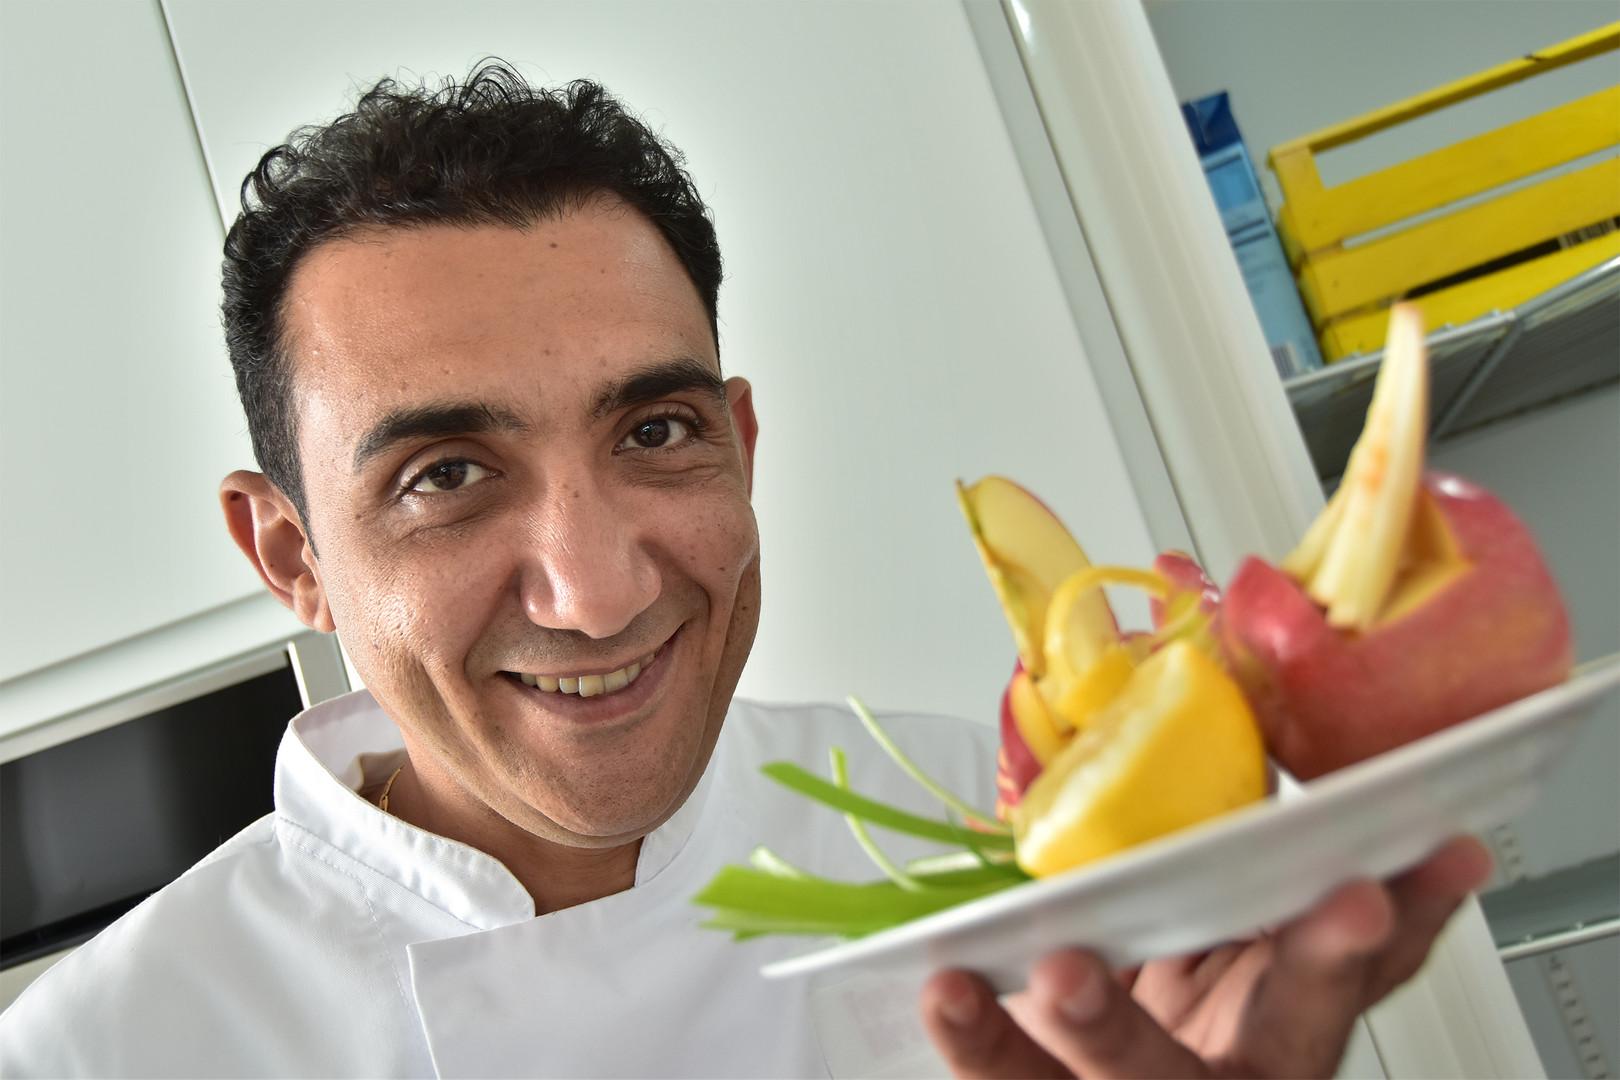 Chef Aly 014 .jpg